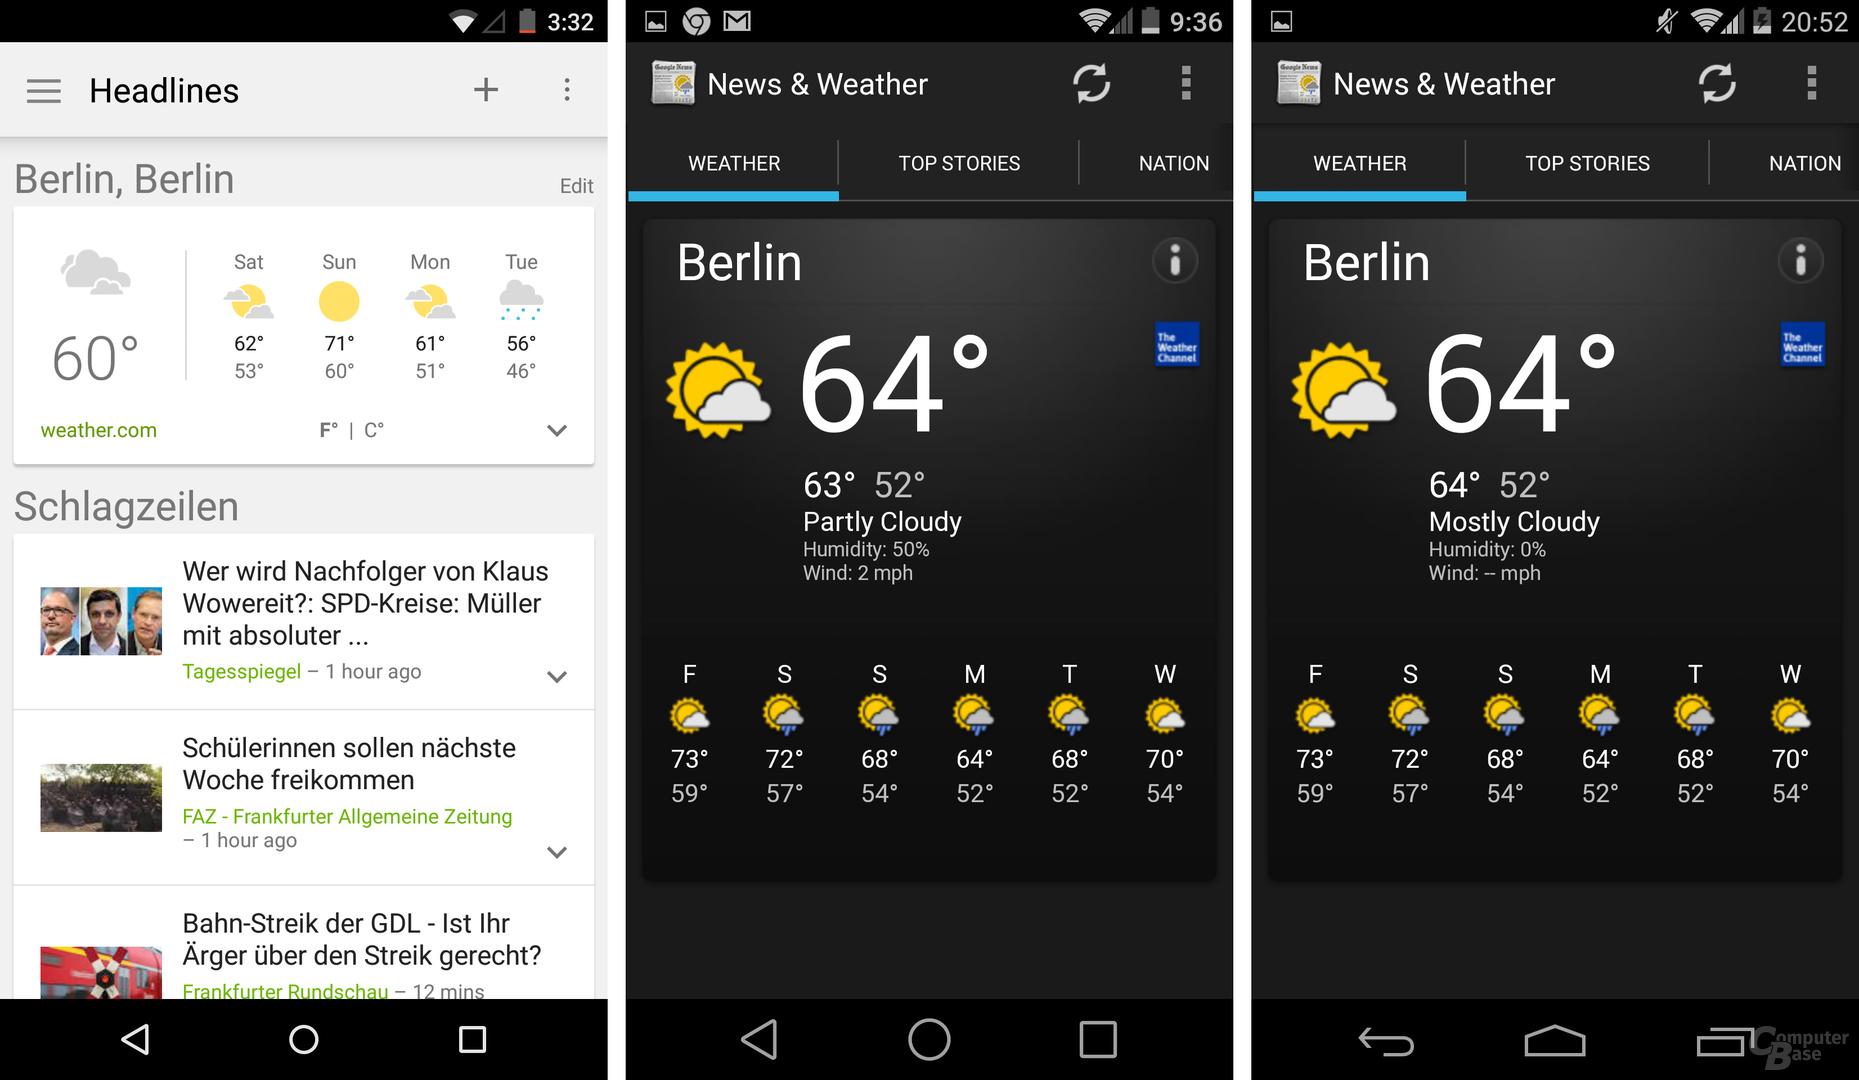 News & Weather